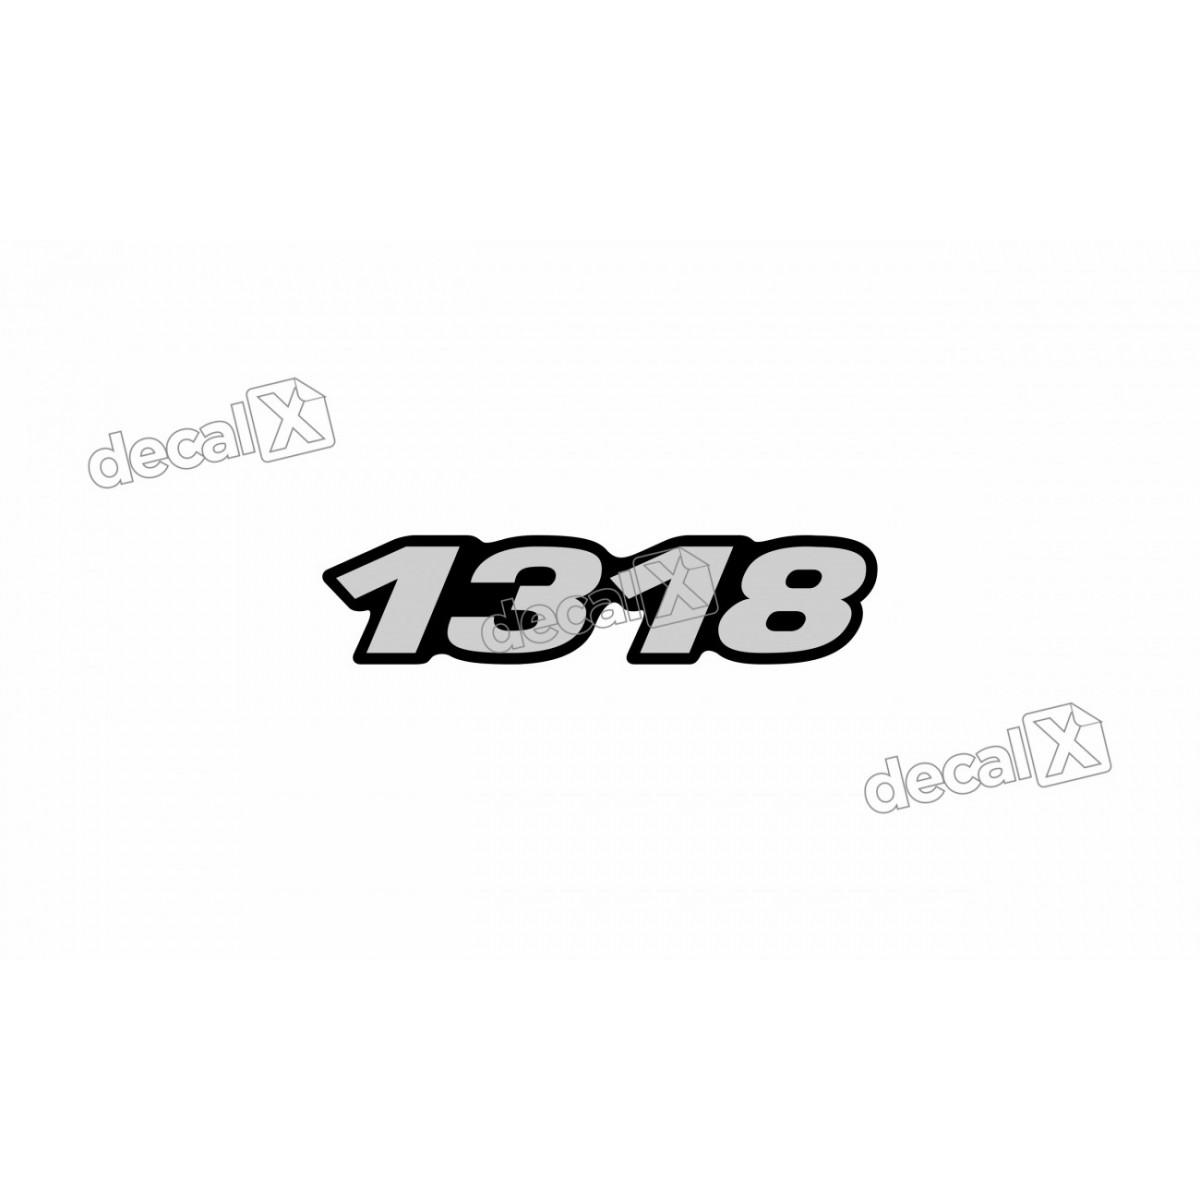 Adesivo Emblema Resinado Mercedes 1318 Cm27 Decalx